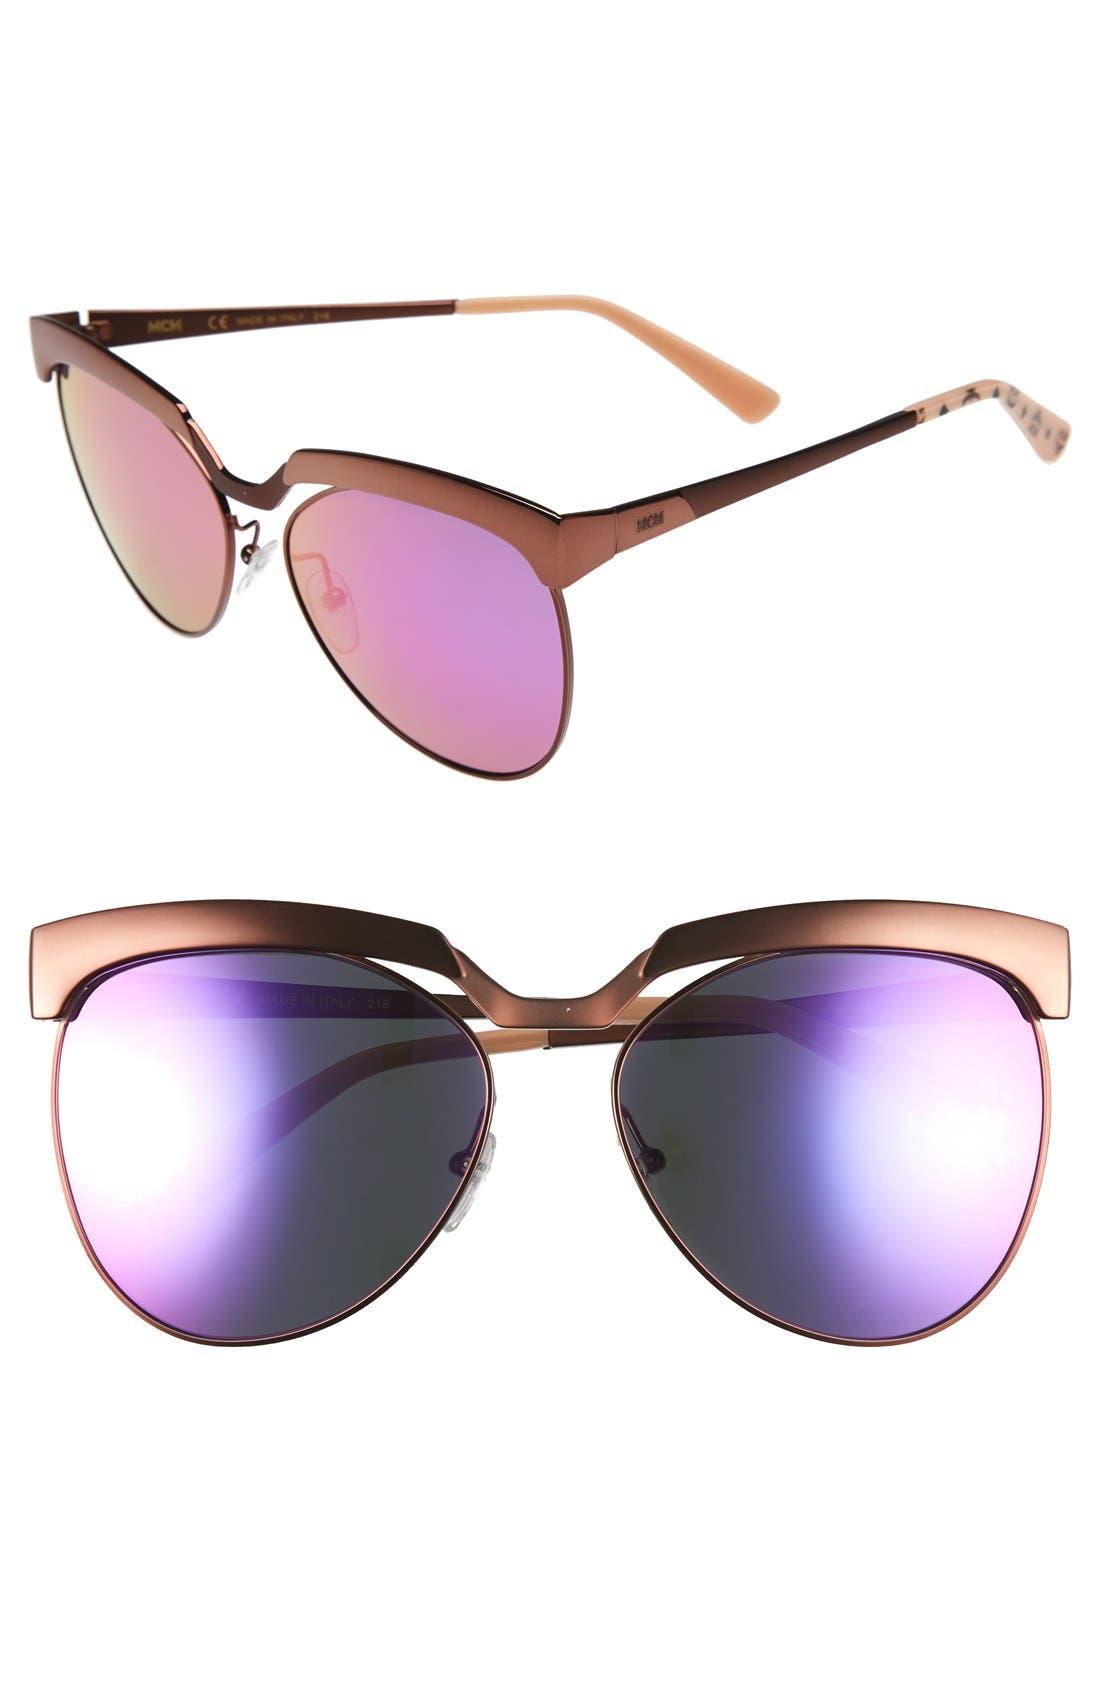 Main Image - MCM 58mm Sunglasses